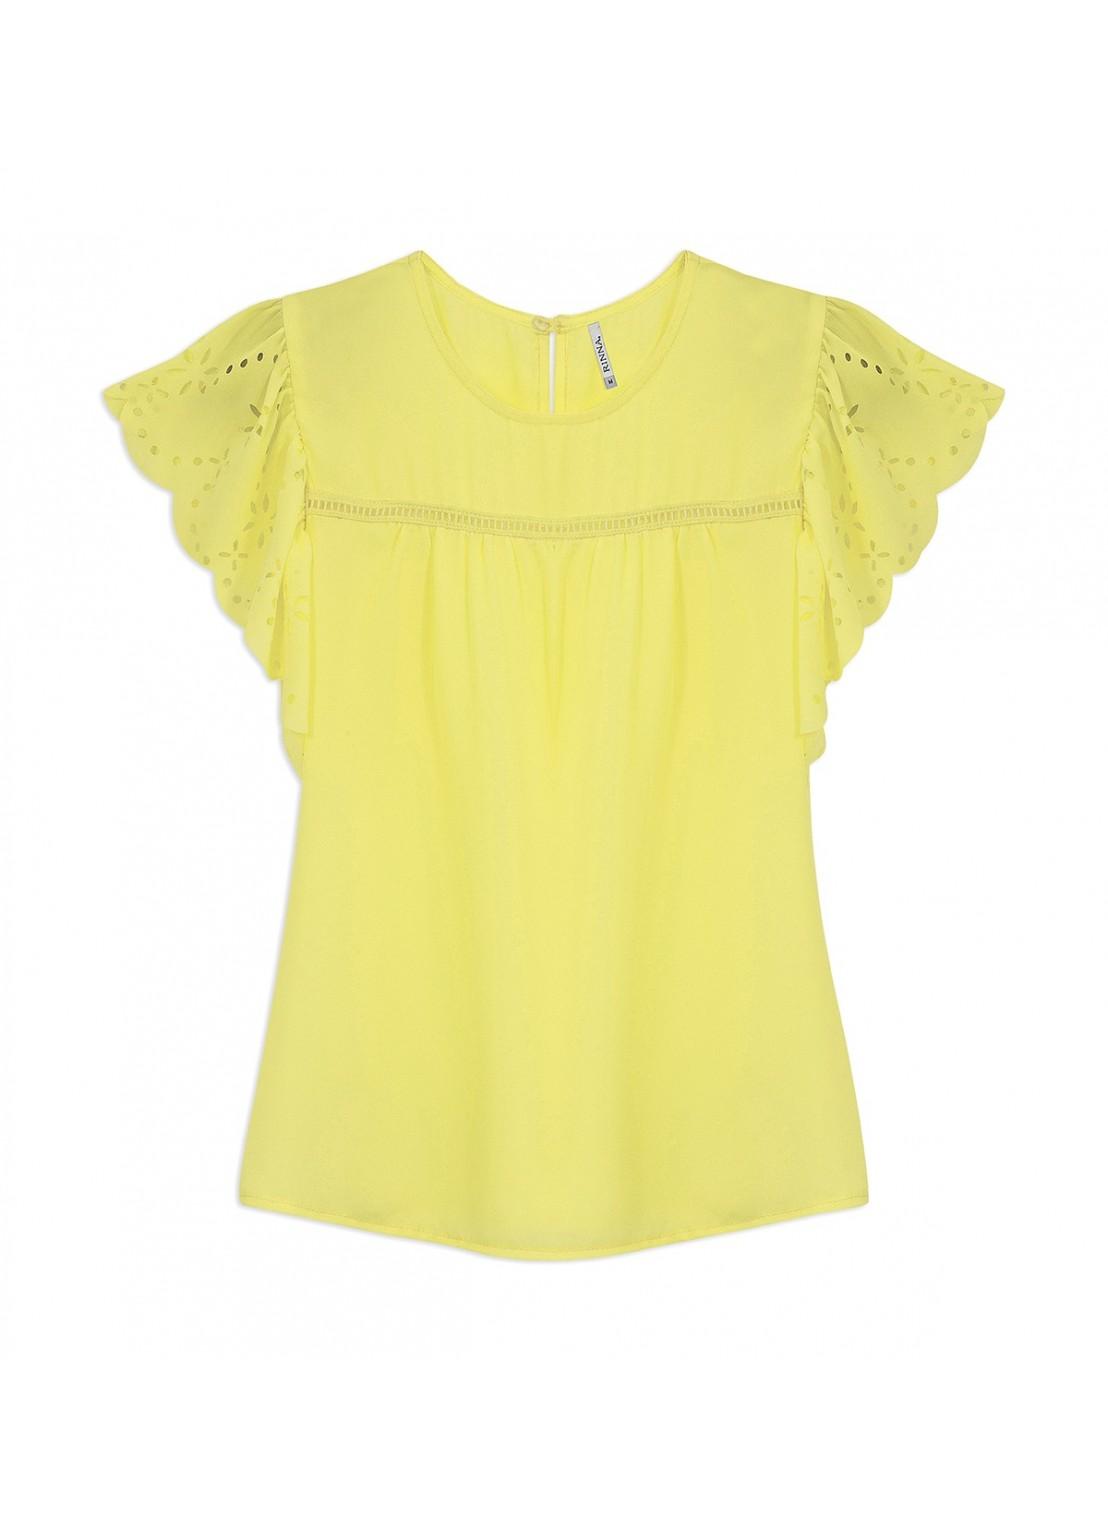 Blusa manga corta amarillo